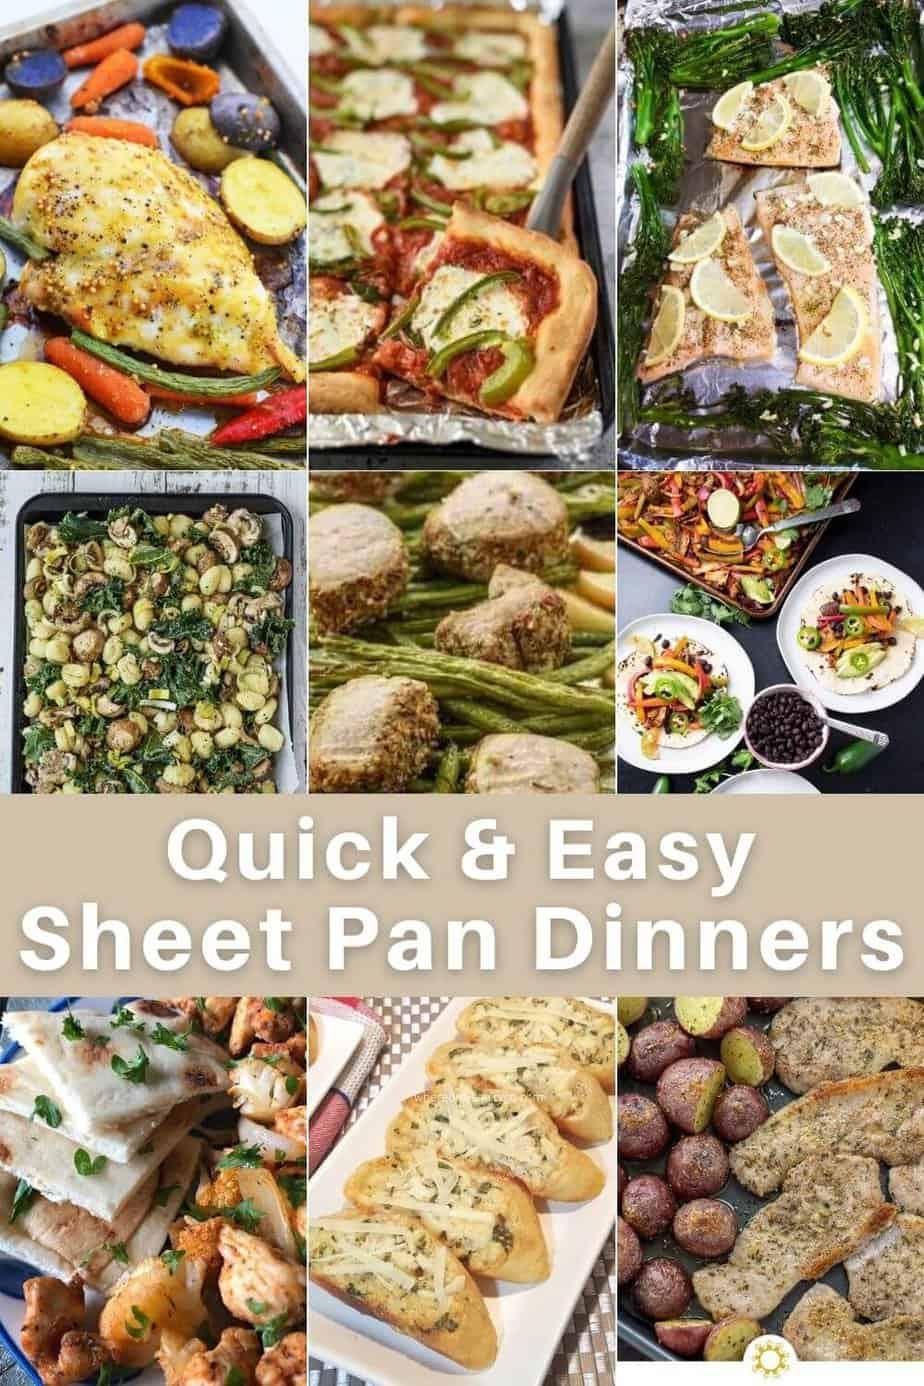 Easy Sheet Pan Dinners